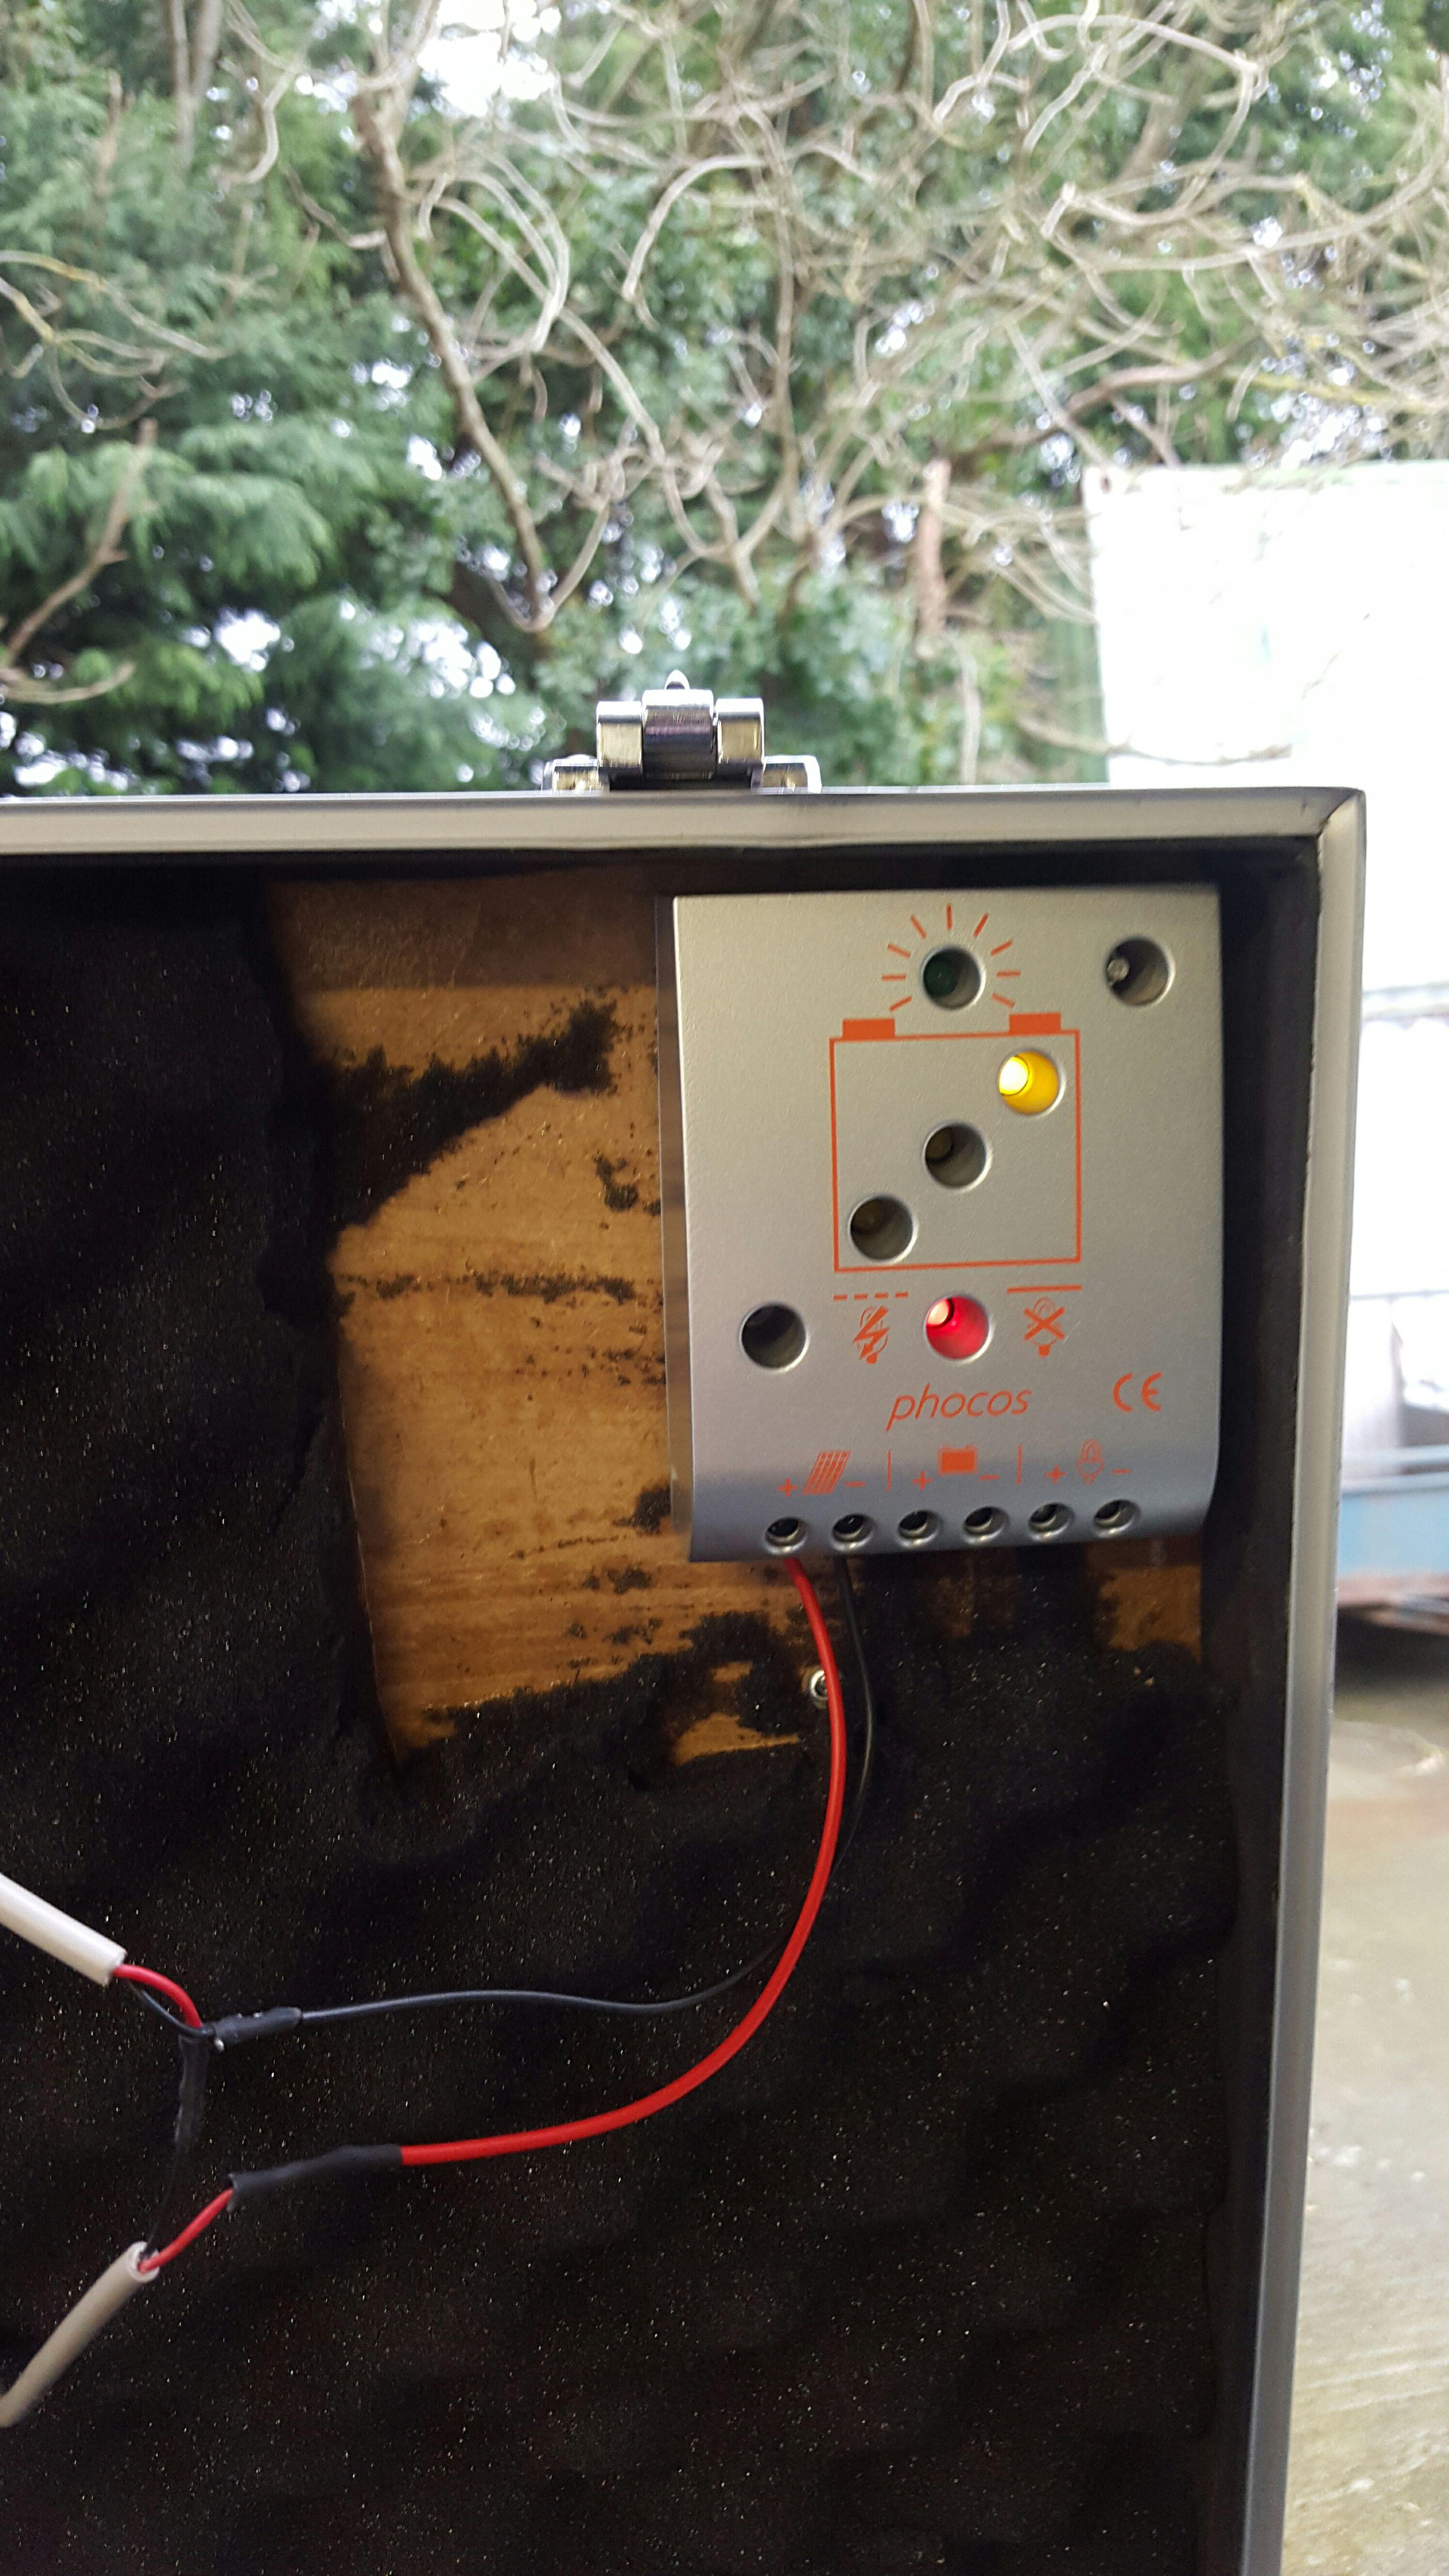 Picture of Solar Panels & Regulator